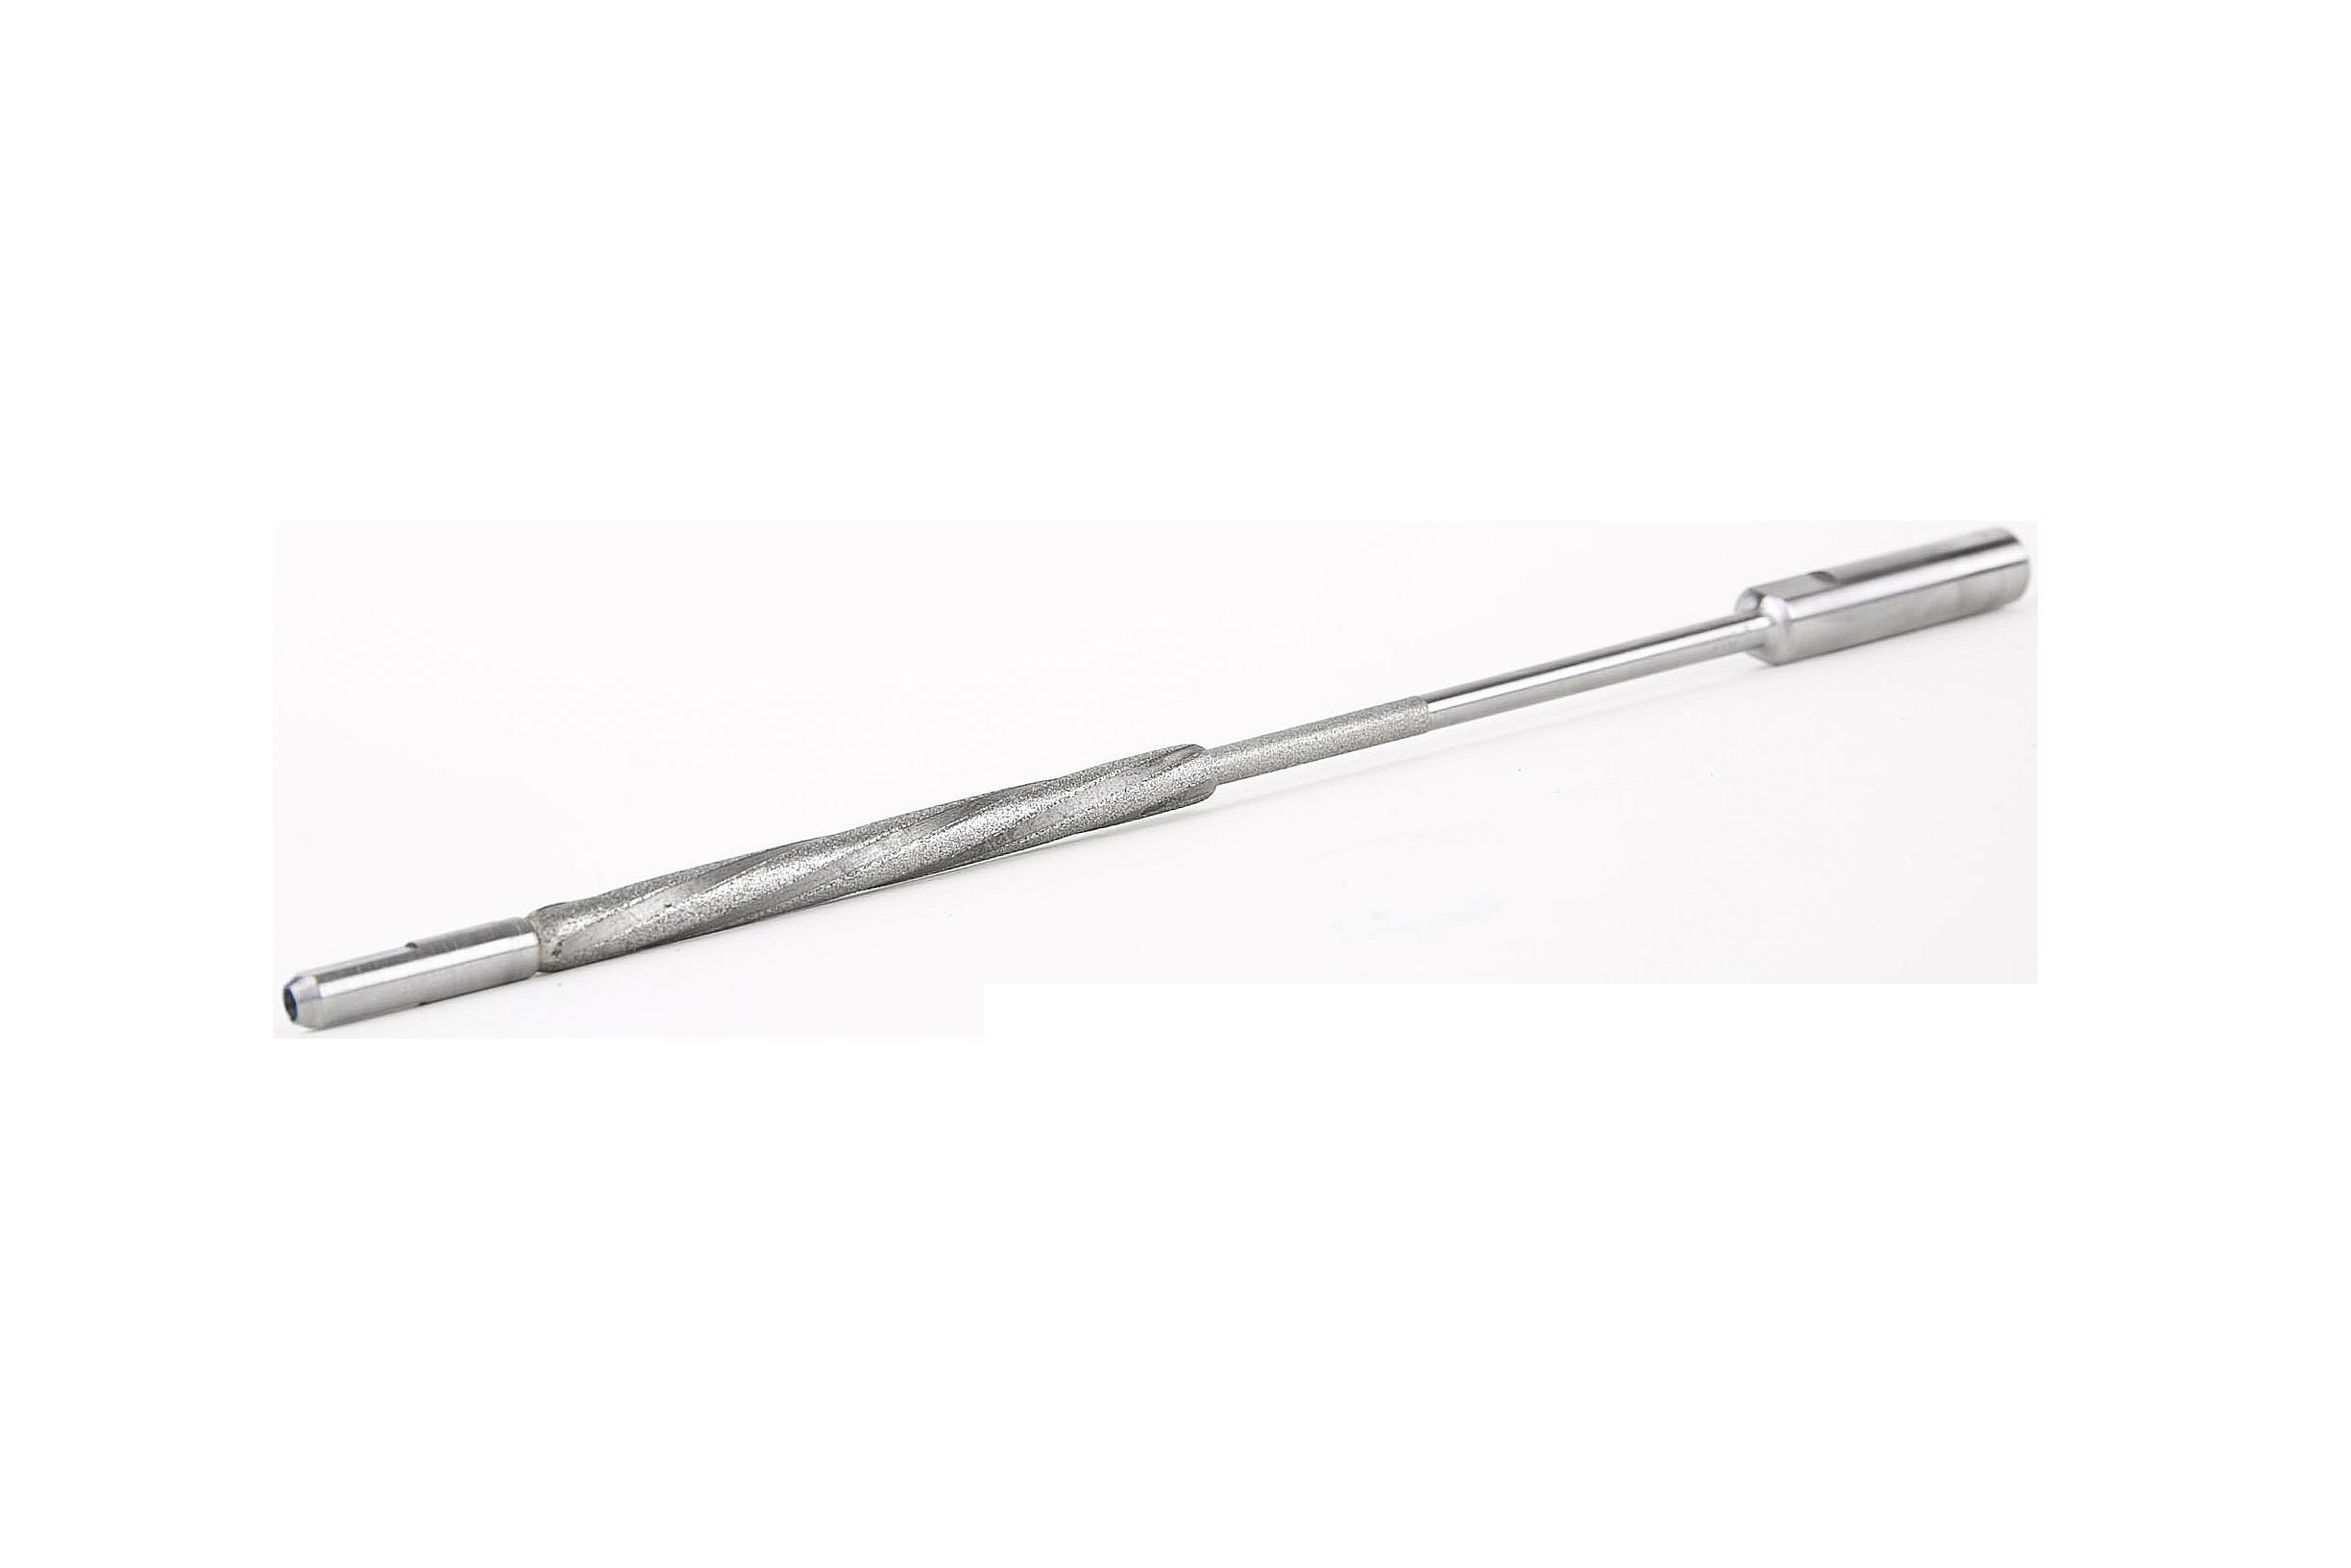 Accu - cut tools-719